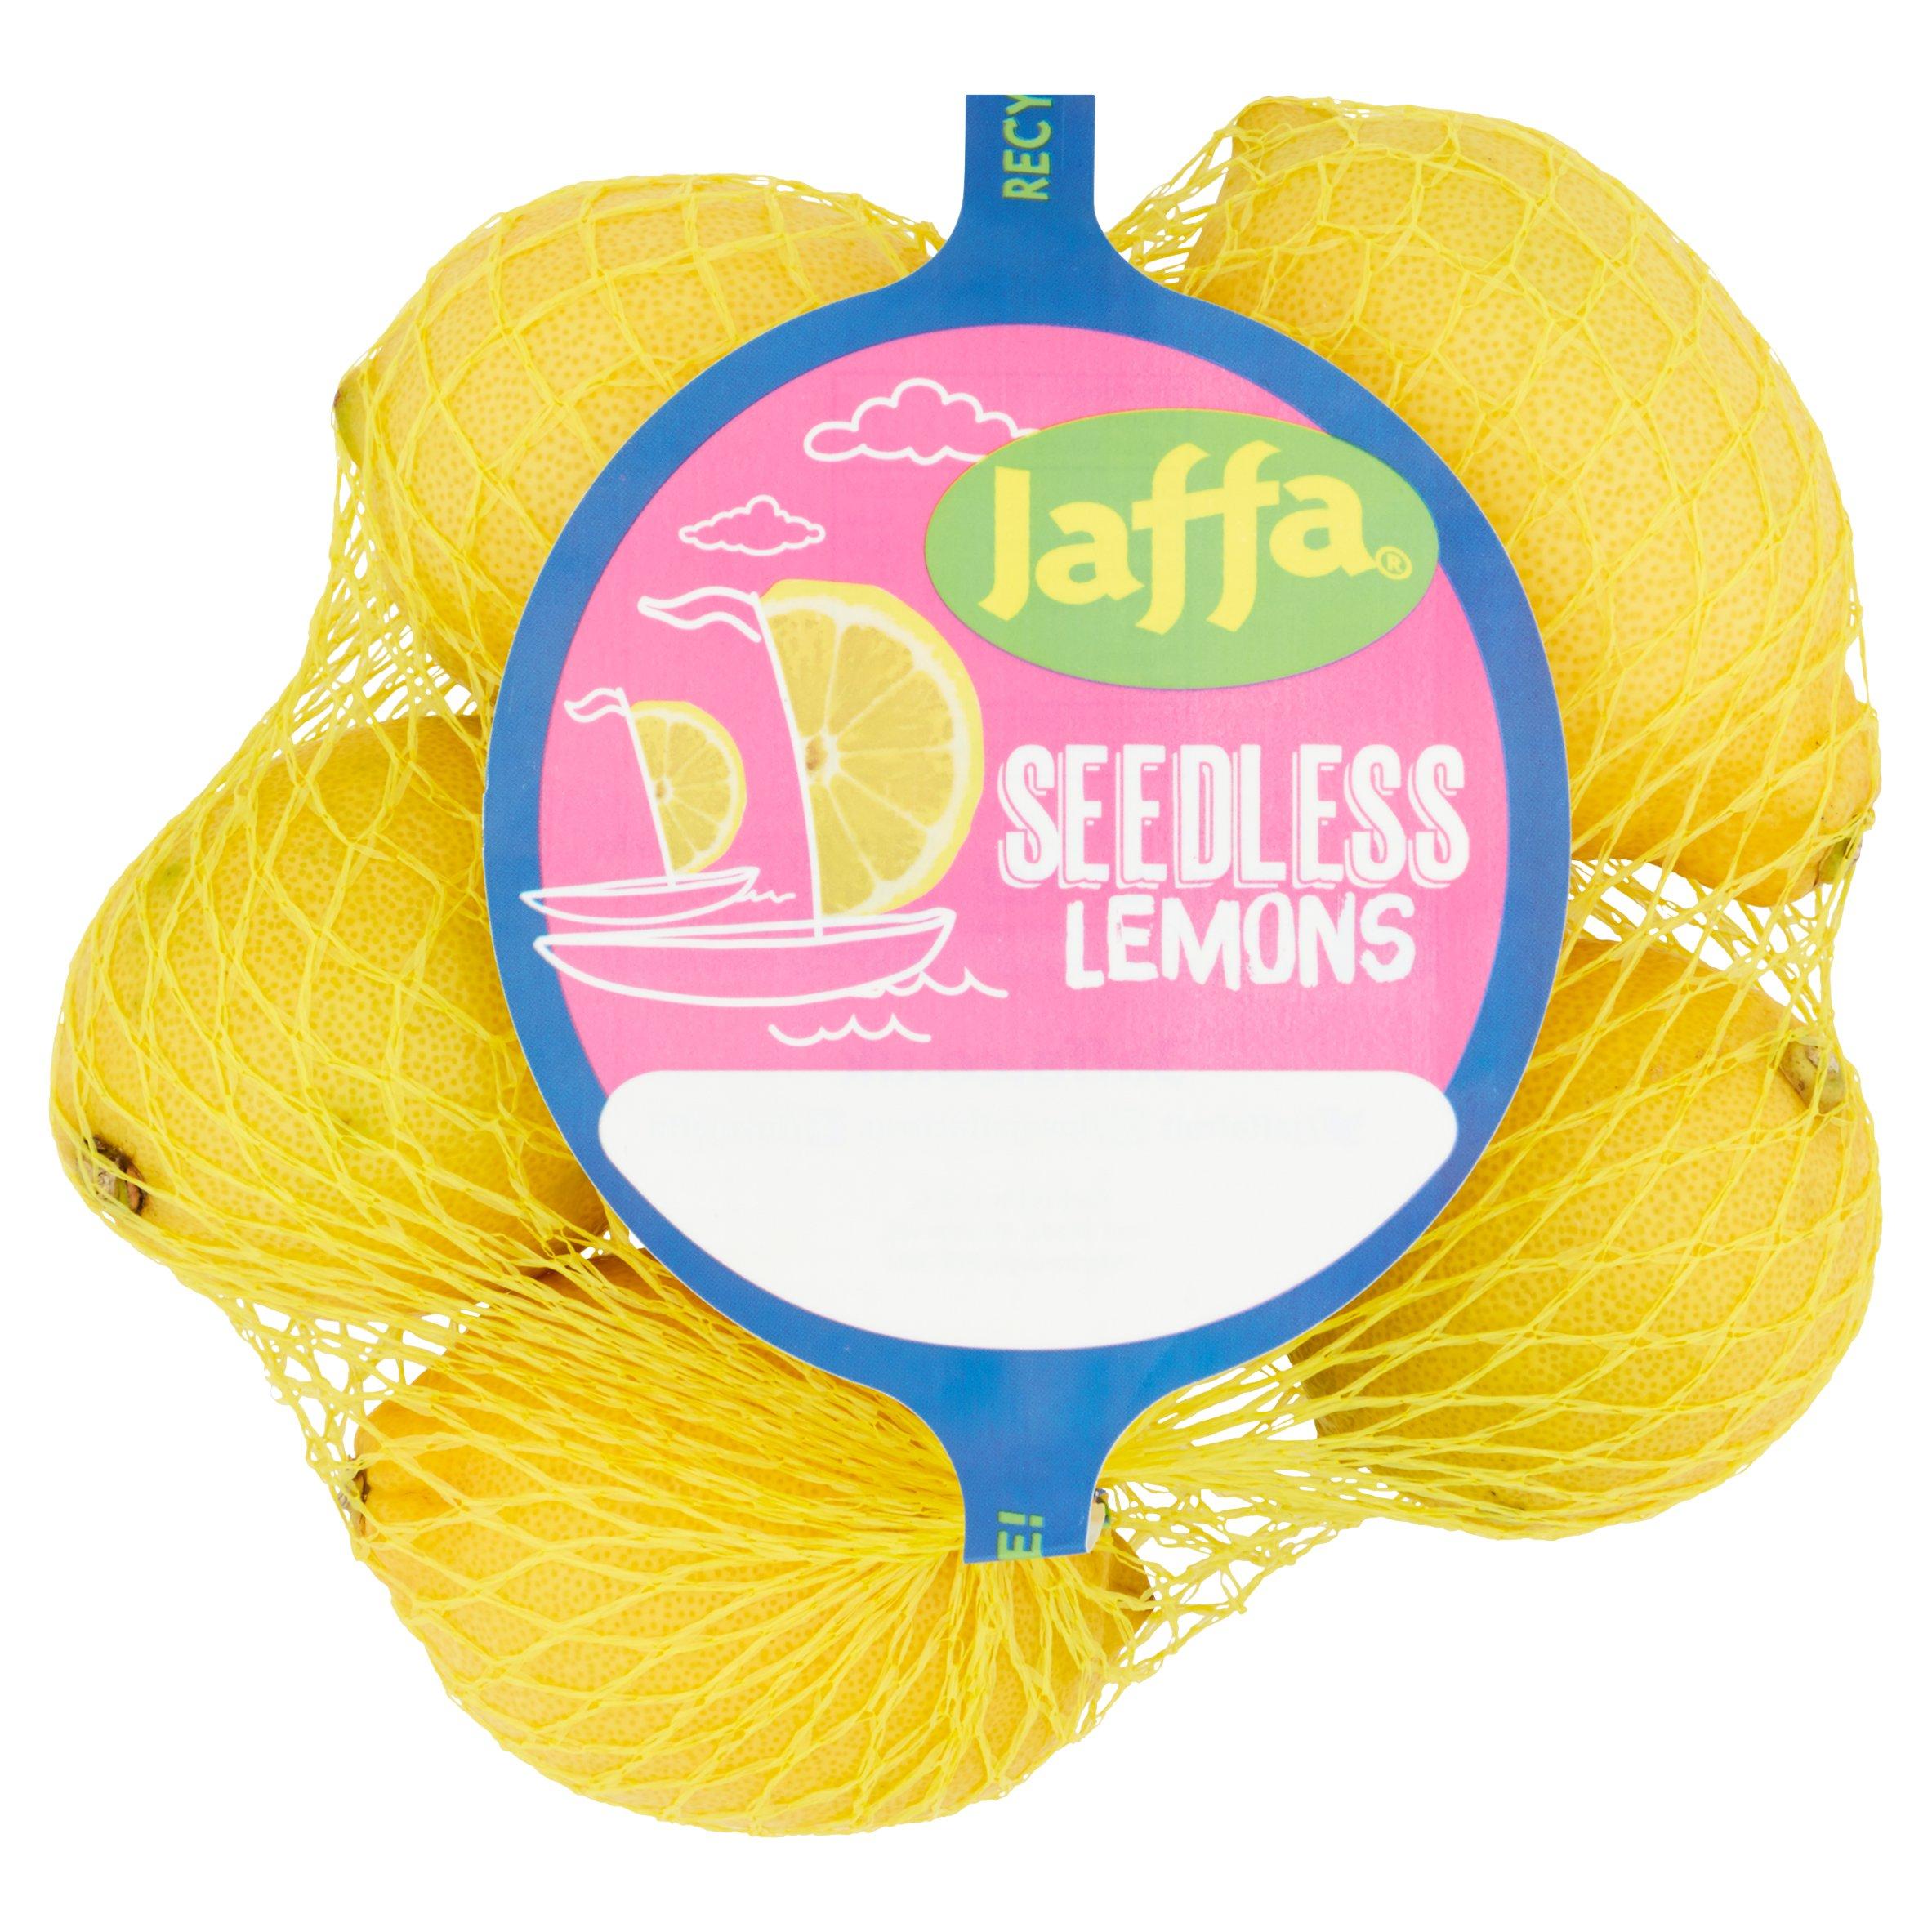 Jaffa Seedless Lemons Minimum 4Pack